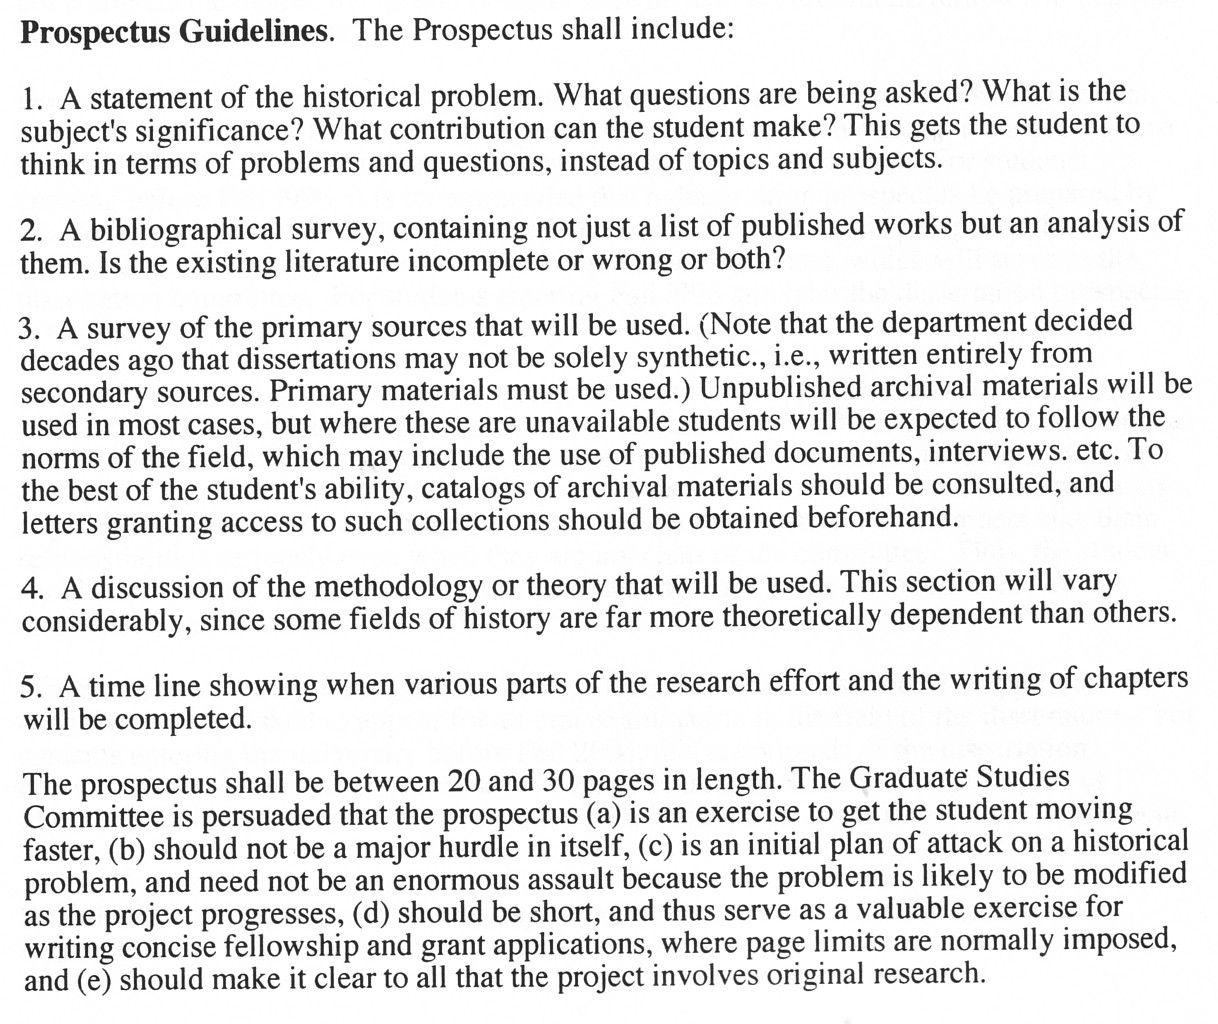 writing a business prospectus business plan pinterest business